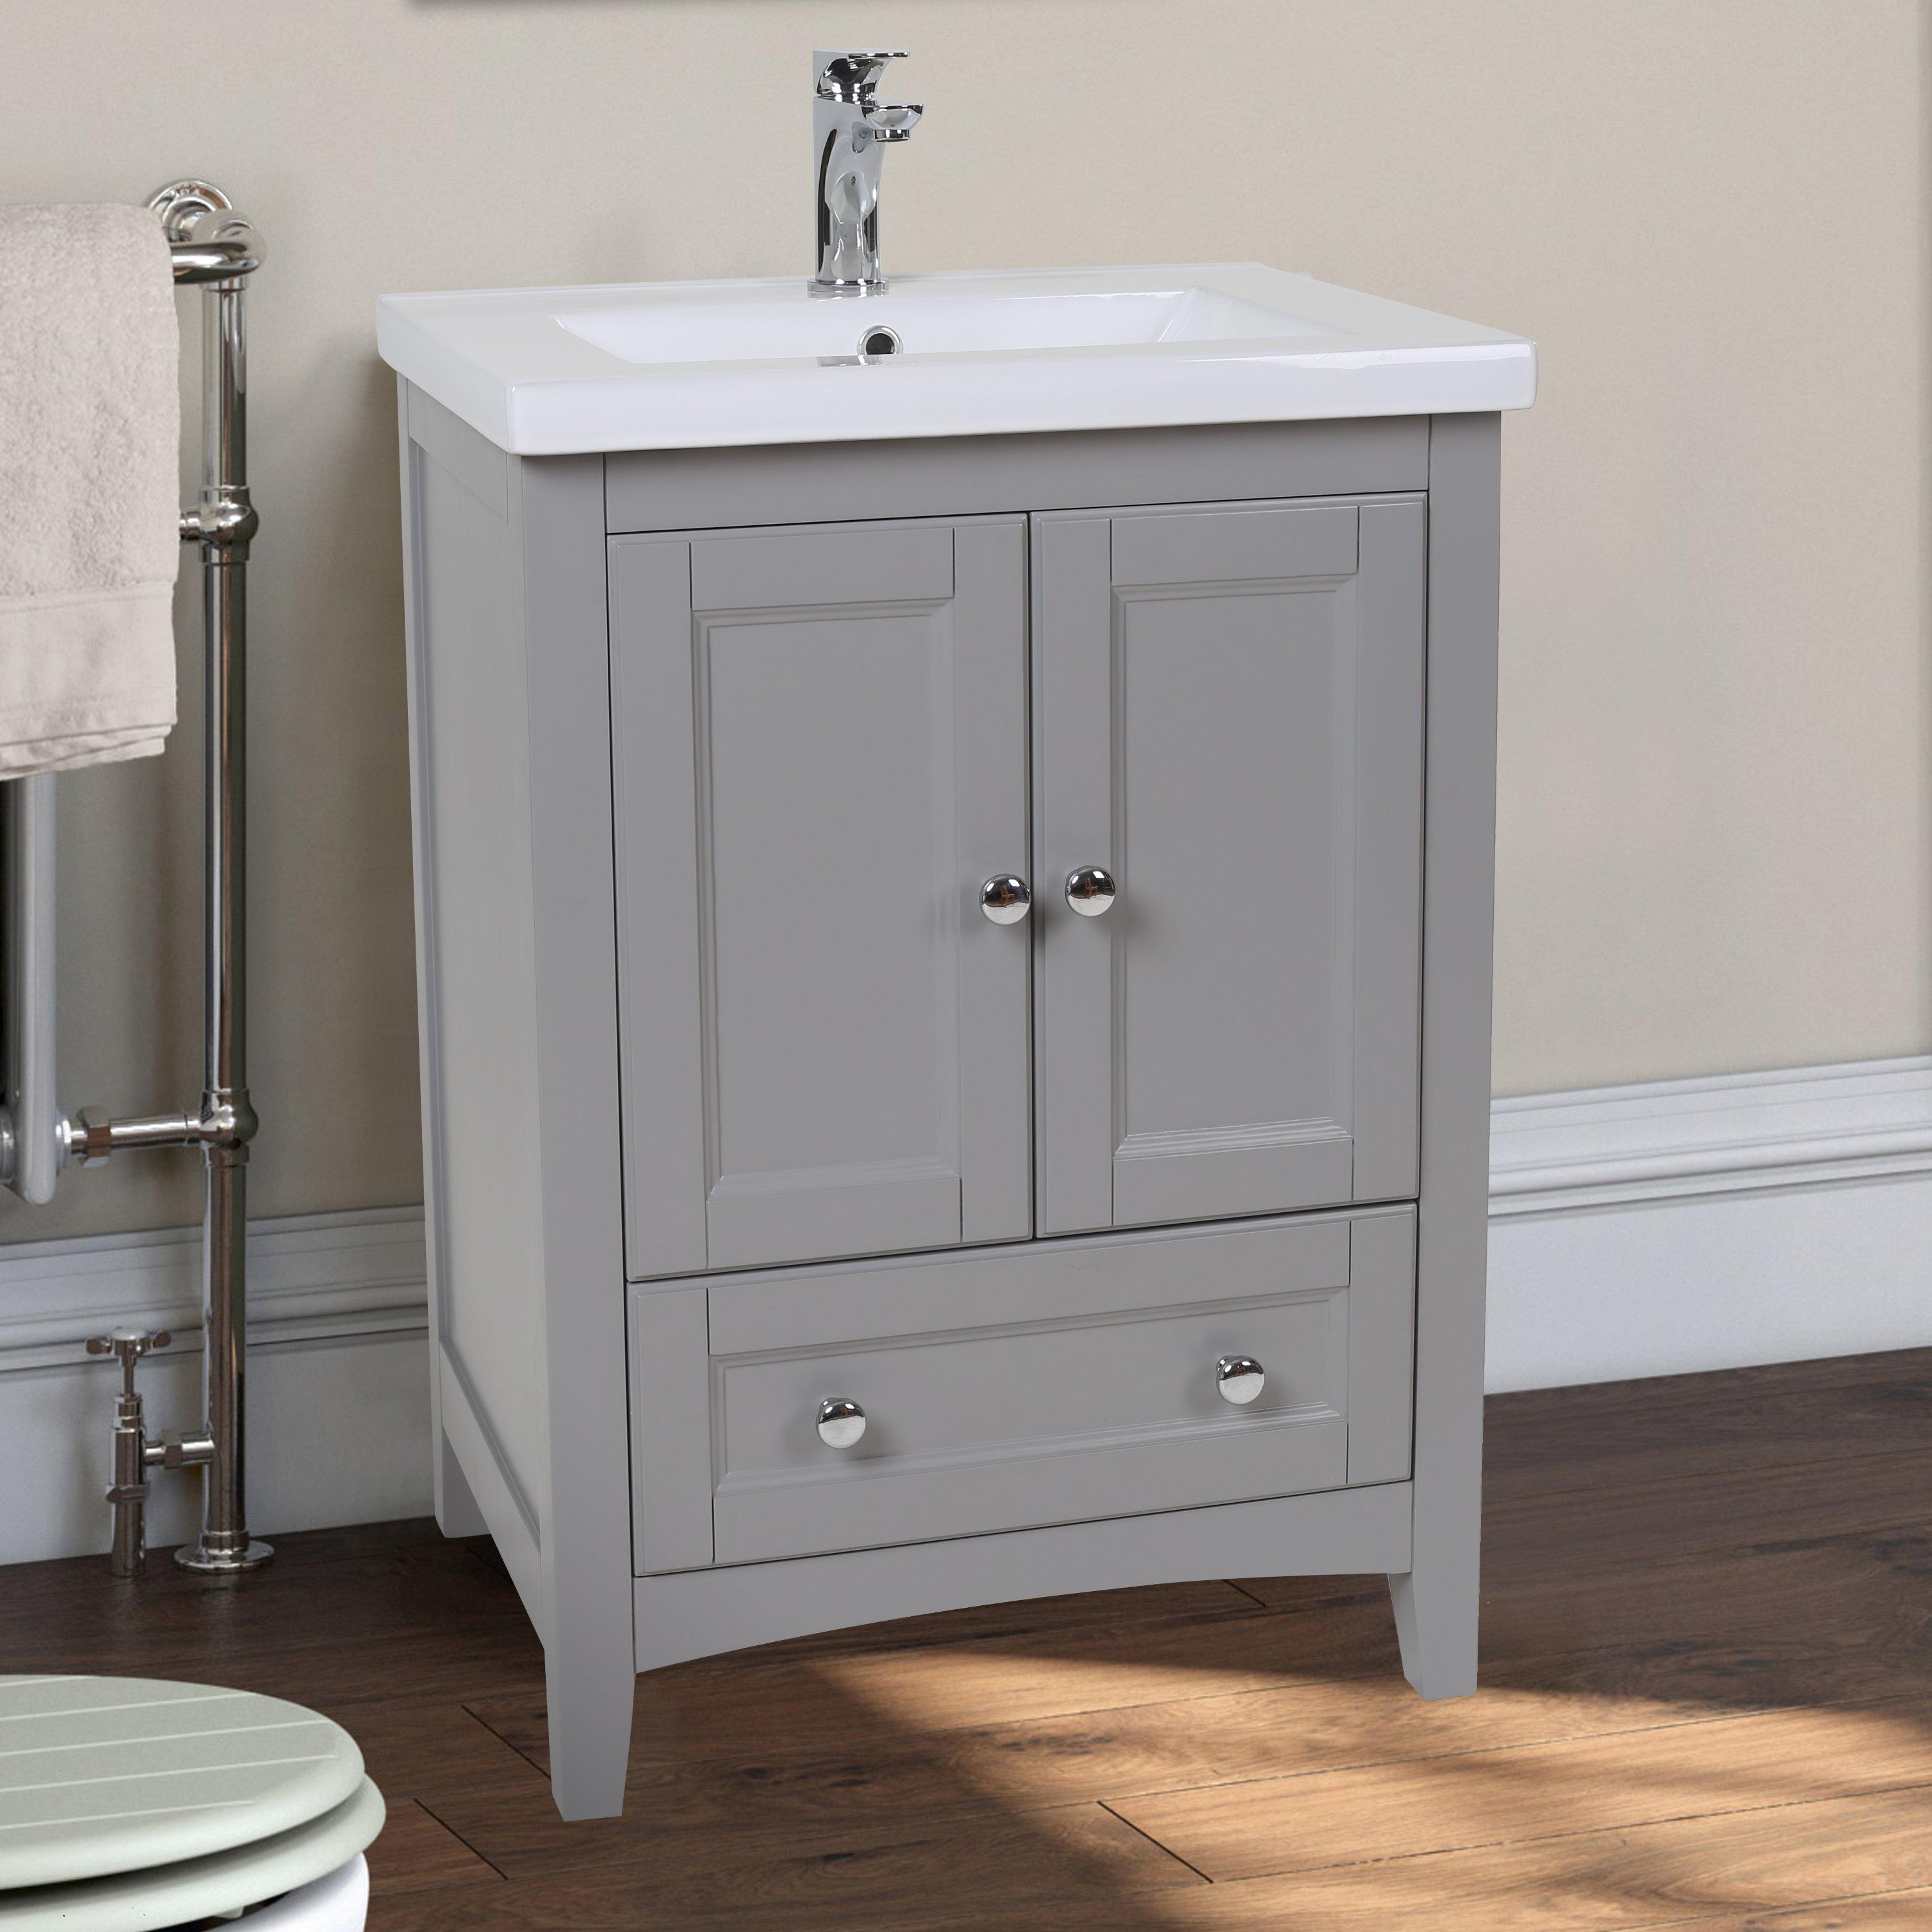 floating high bathroom vanity caen hgw optional mirror mount vanities rs modern white wall buy inch glossy set